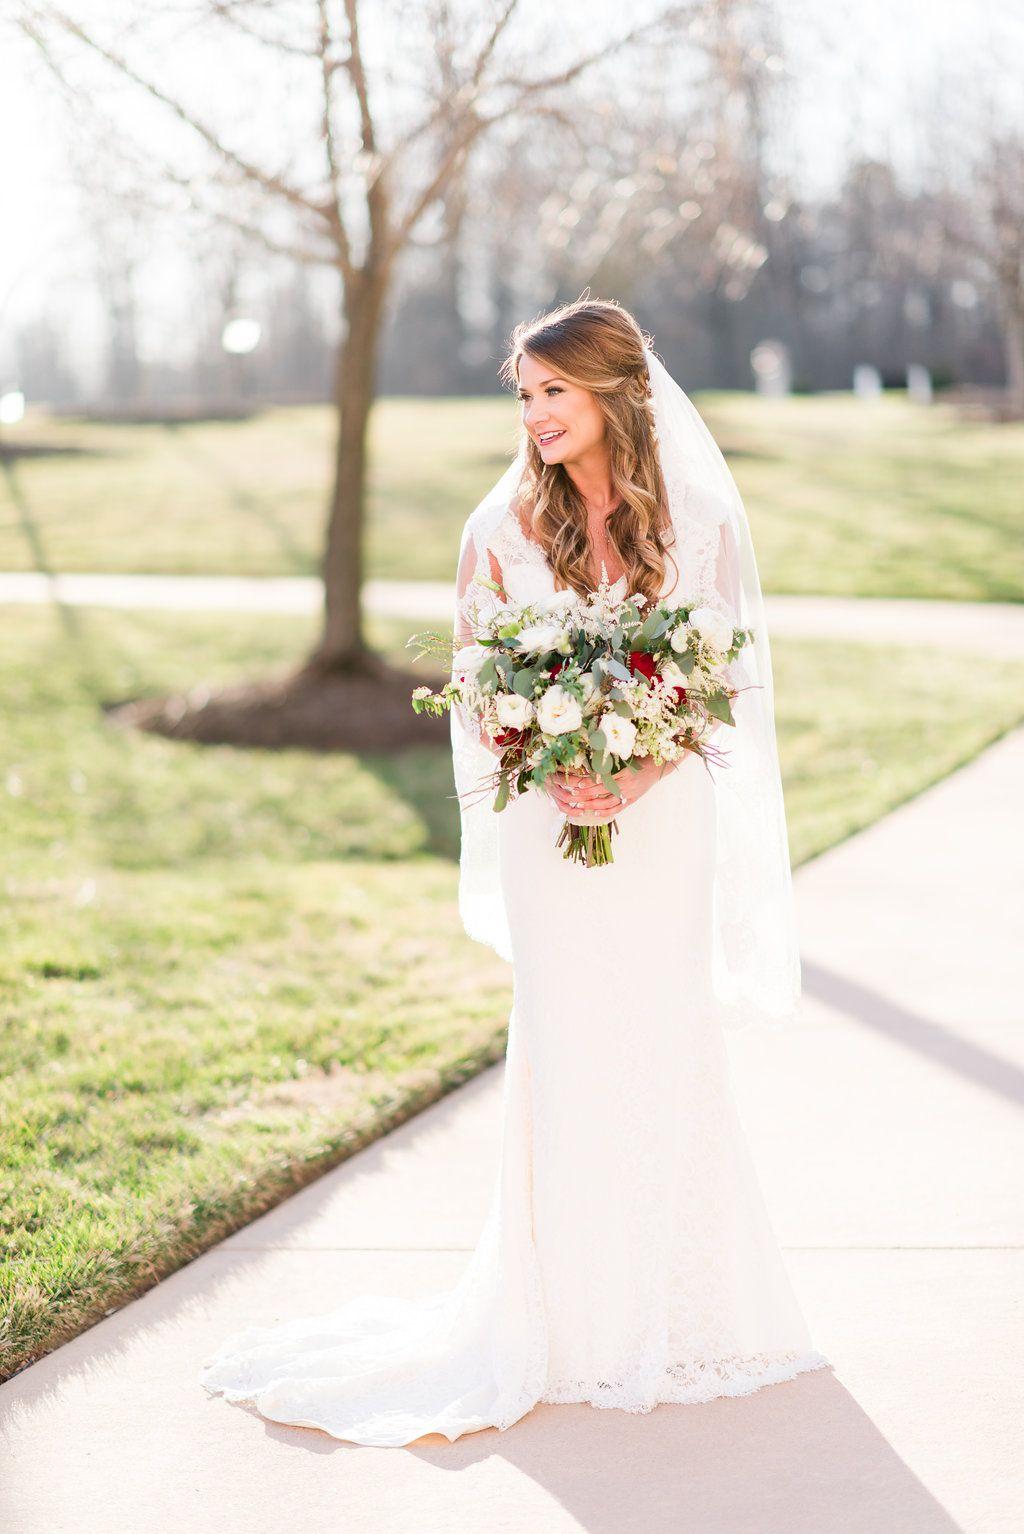 Elegant winter wedding Tanglewood Church and Winmock at Kinderton